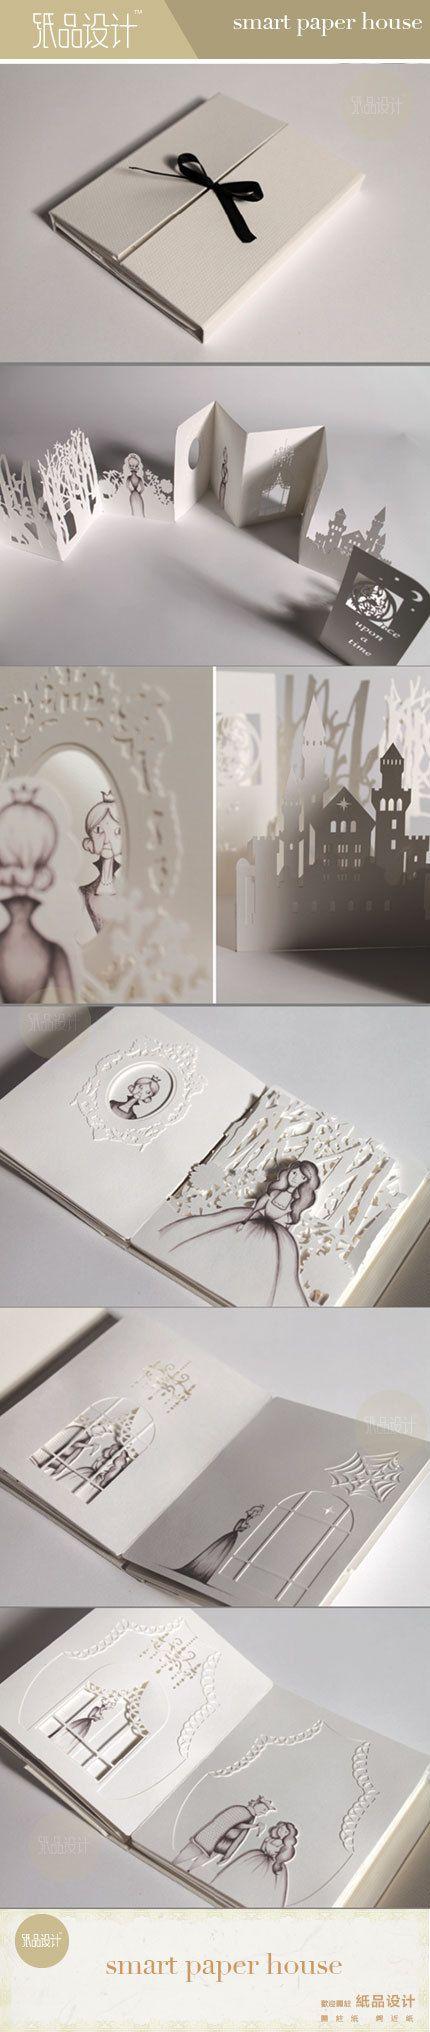 The Hiroko Matshushita The paper-cut book works, wow